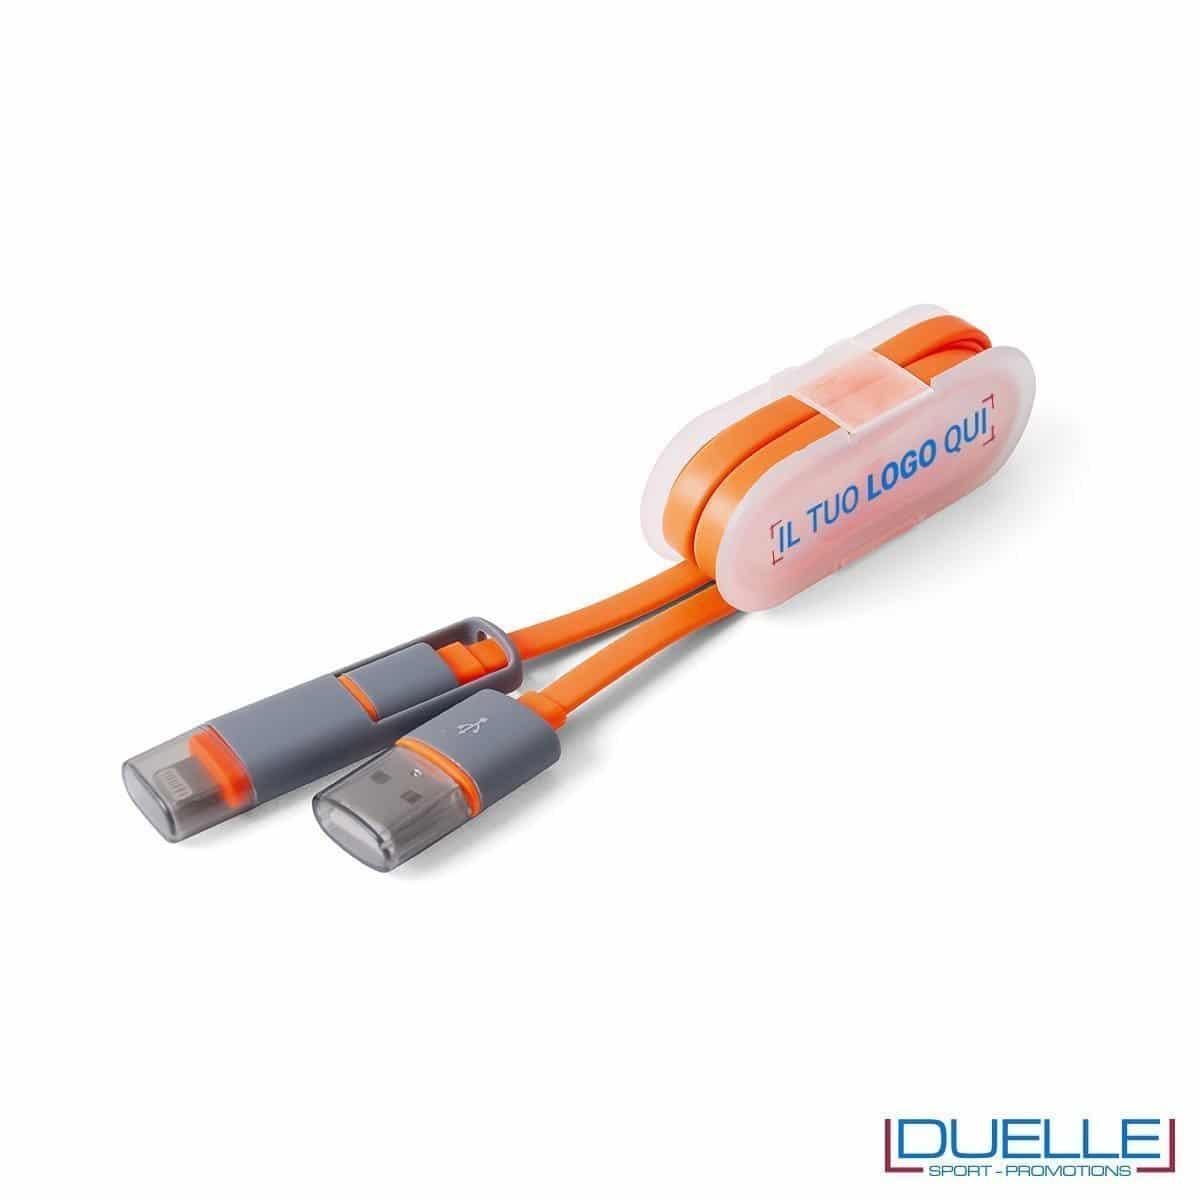 cavetto adattatore per smartphone personalizzato, gadget per smartphone personalizzabile in colore arancione